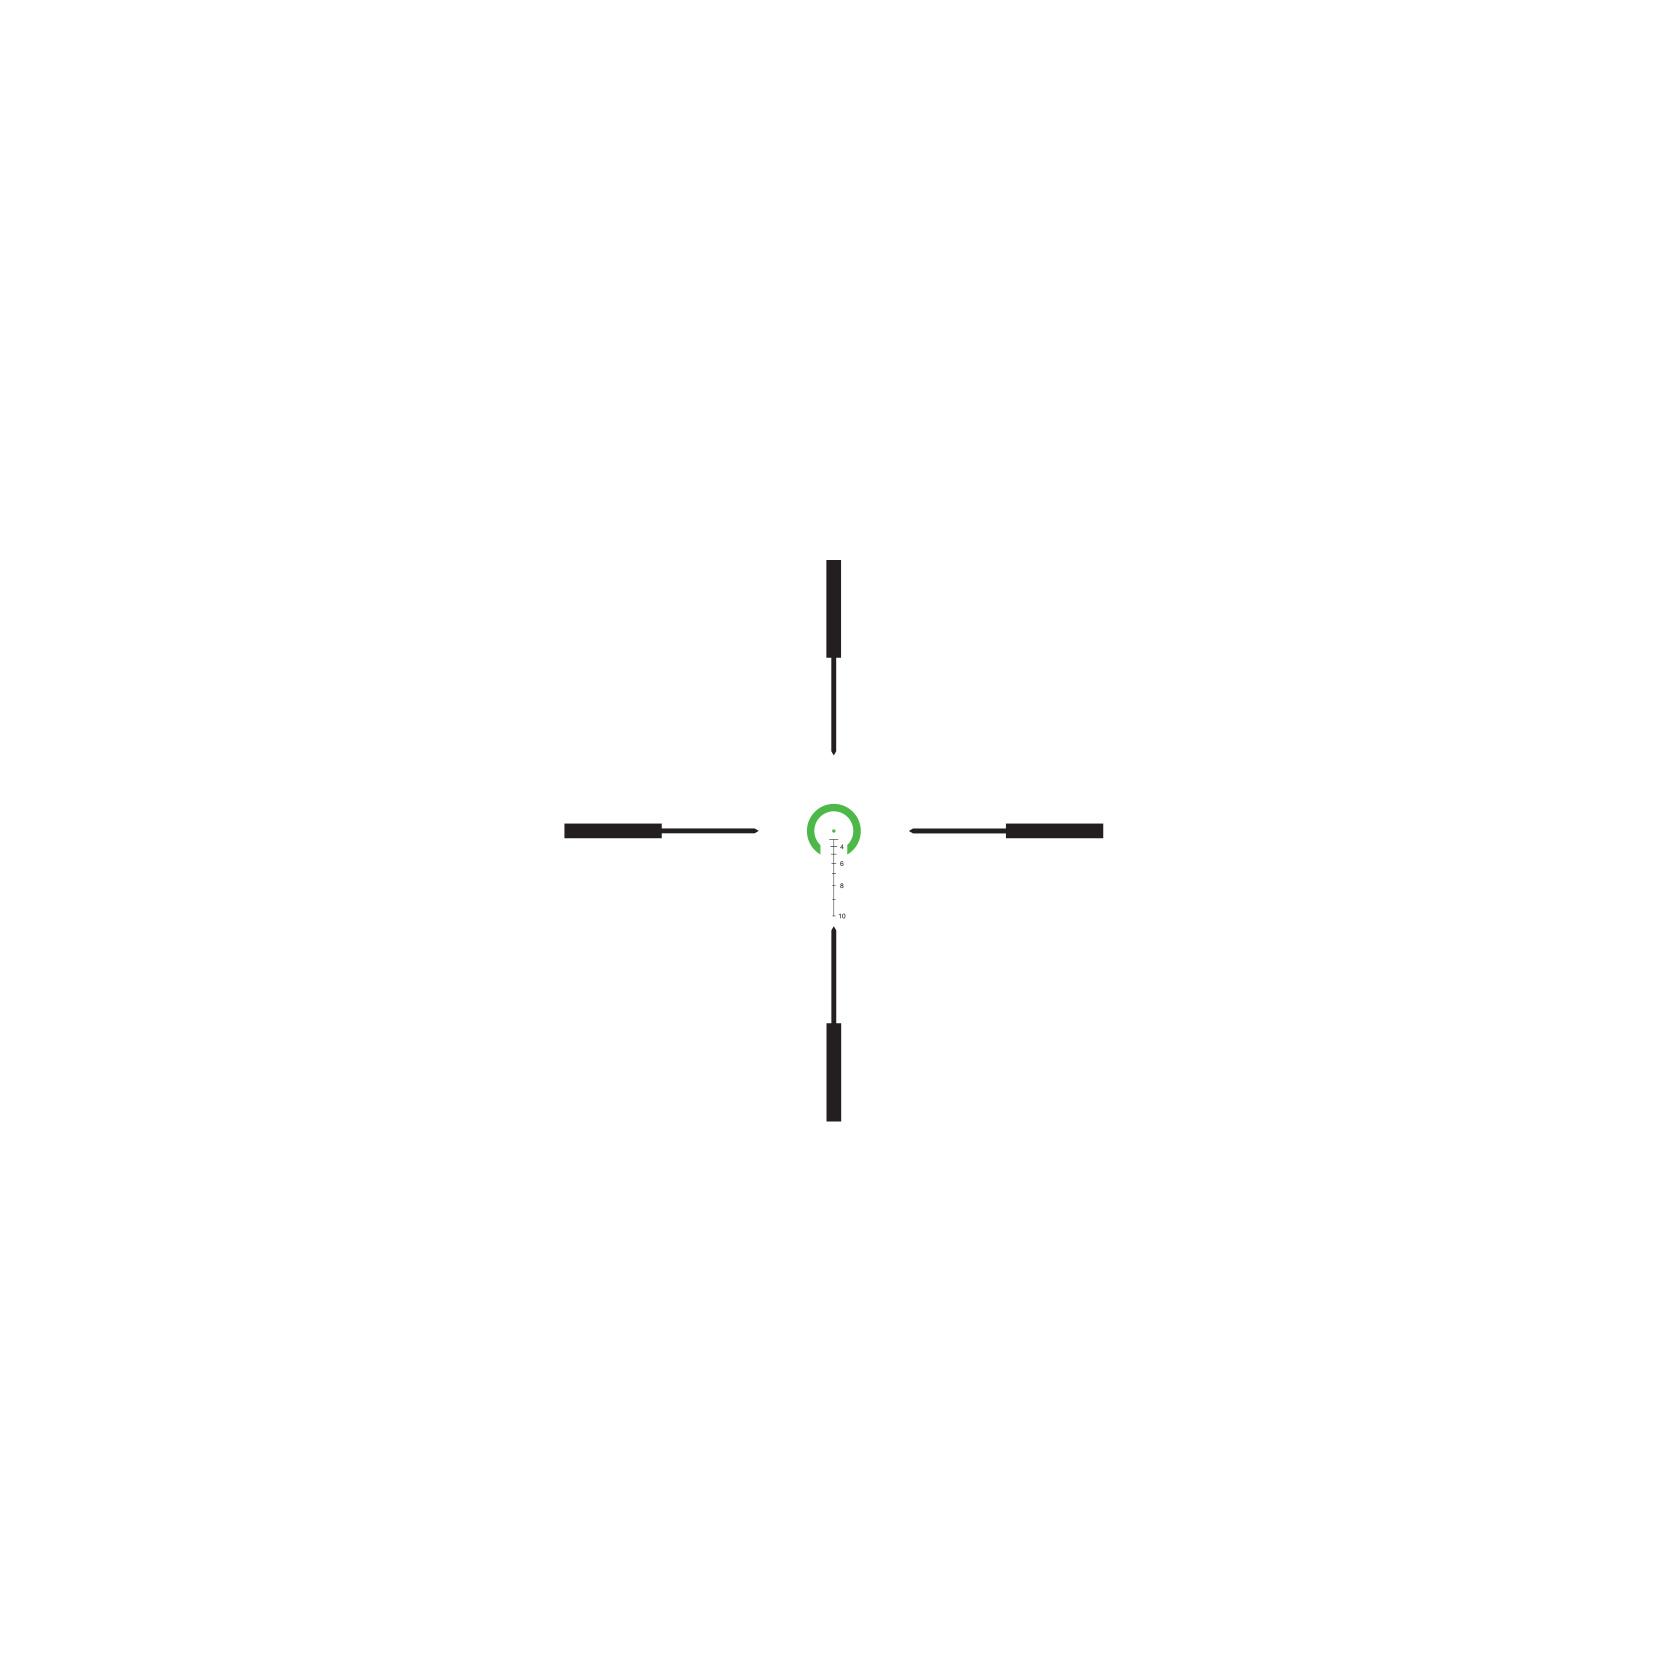 Trijicon VCOG<sup>®</sup> 1-6x24 LED Riflescope - .308 / 175 Grain RETICLE